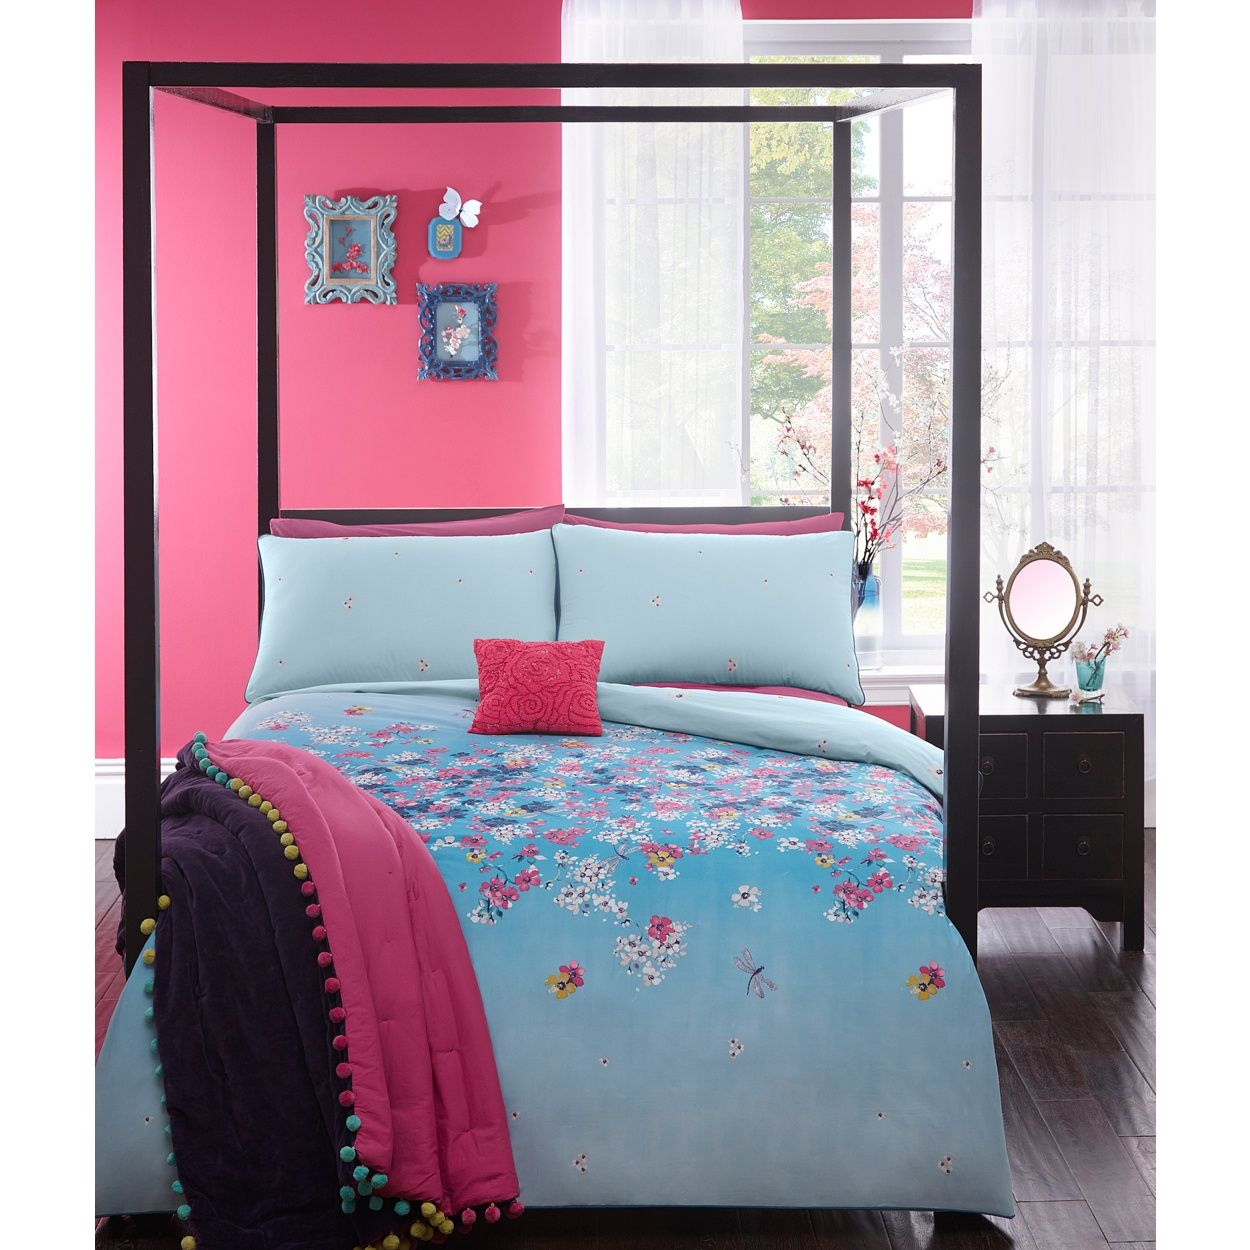 Butterfly Home By Matthew Williamson Blue U0027Cherry Blossomu0027 Bedding Set